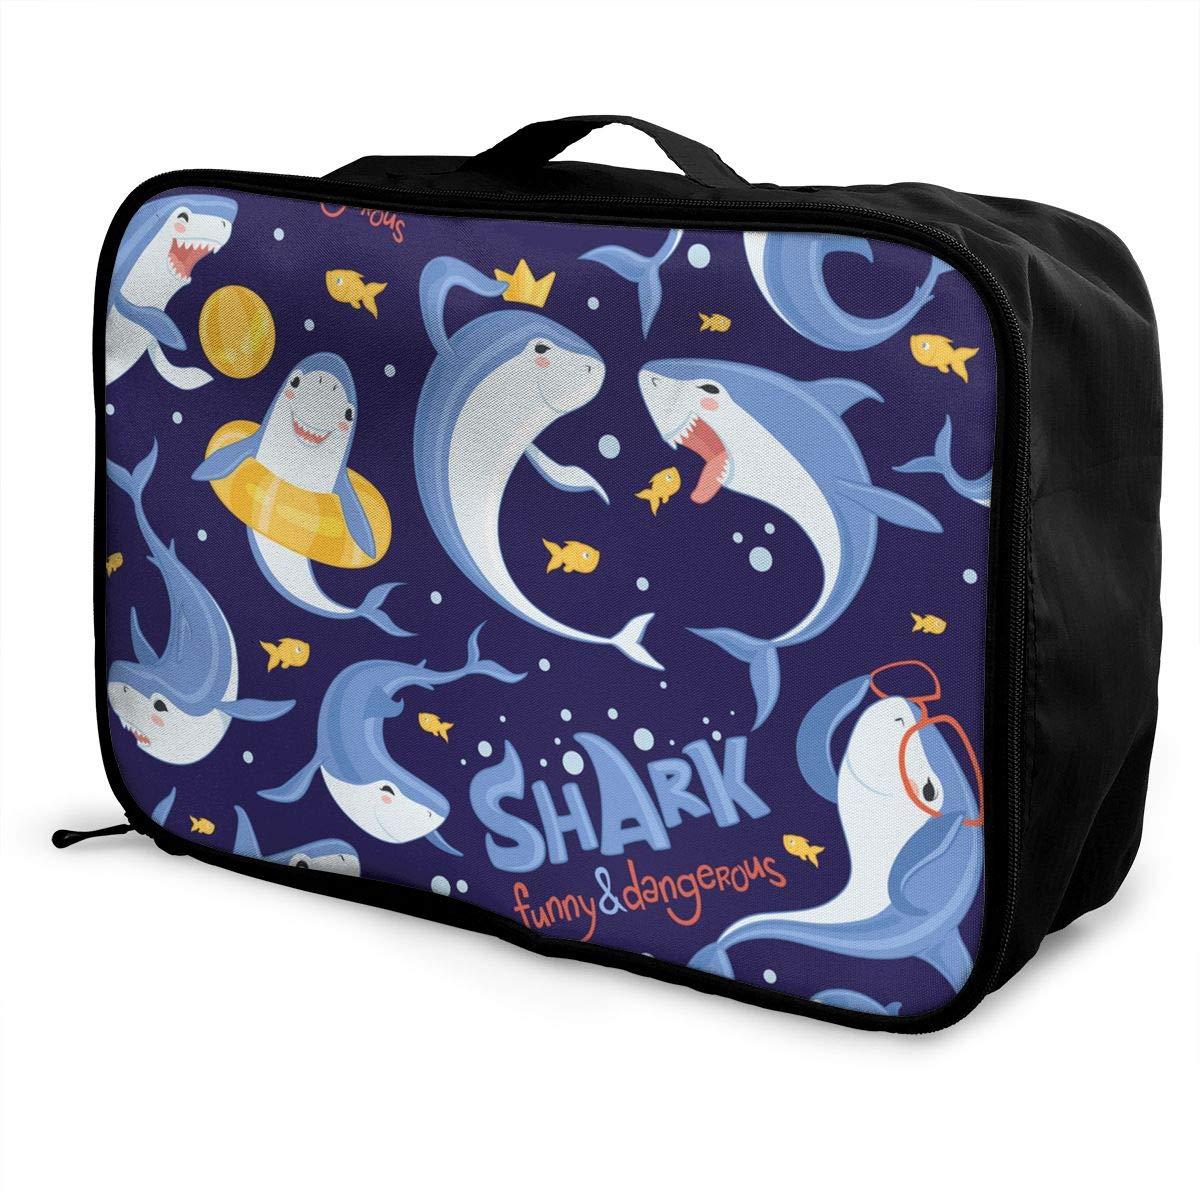 Shark Pattern Sea Ocean Fish Blue Scare Animal Canvas Travel Weekender Bag,Fashion Custom Lightweight Large Capacity Portable Luggage Bag,Suitcase Trolley Bag